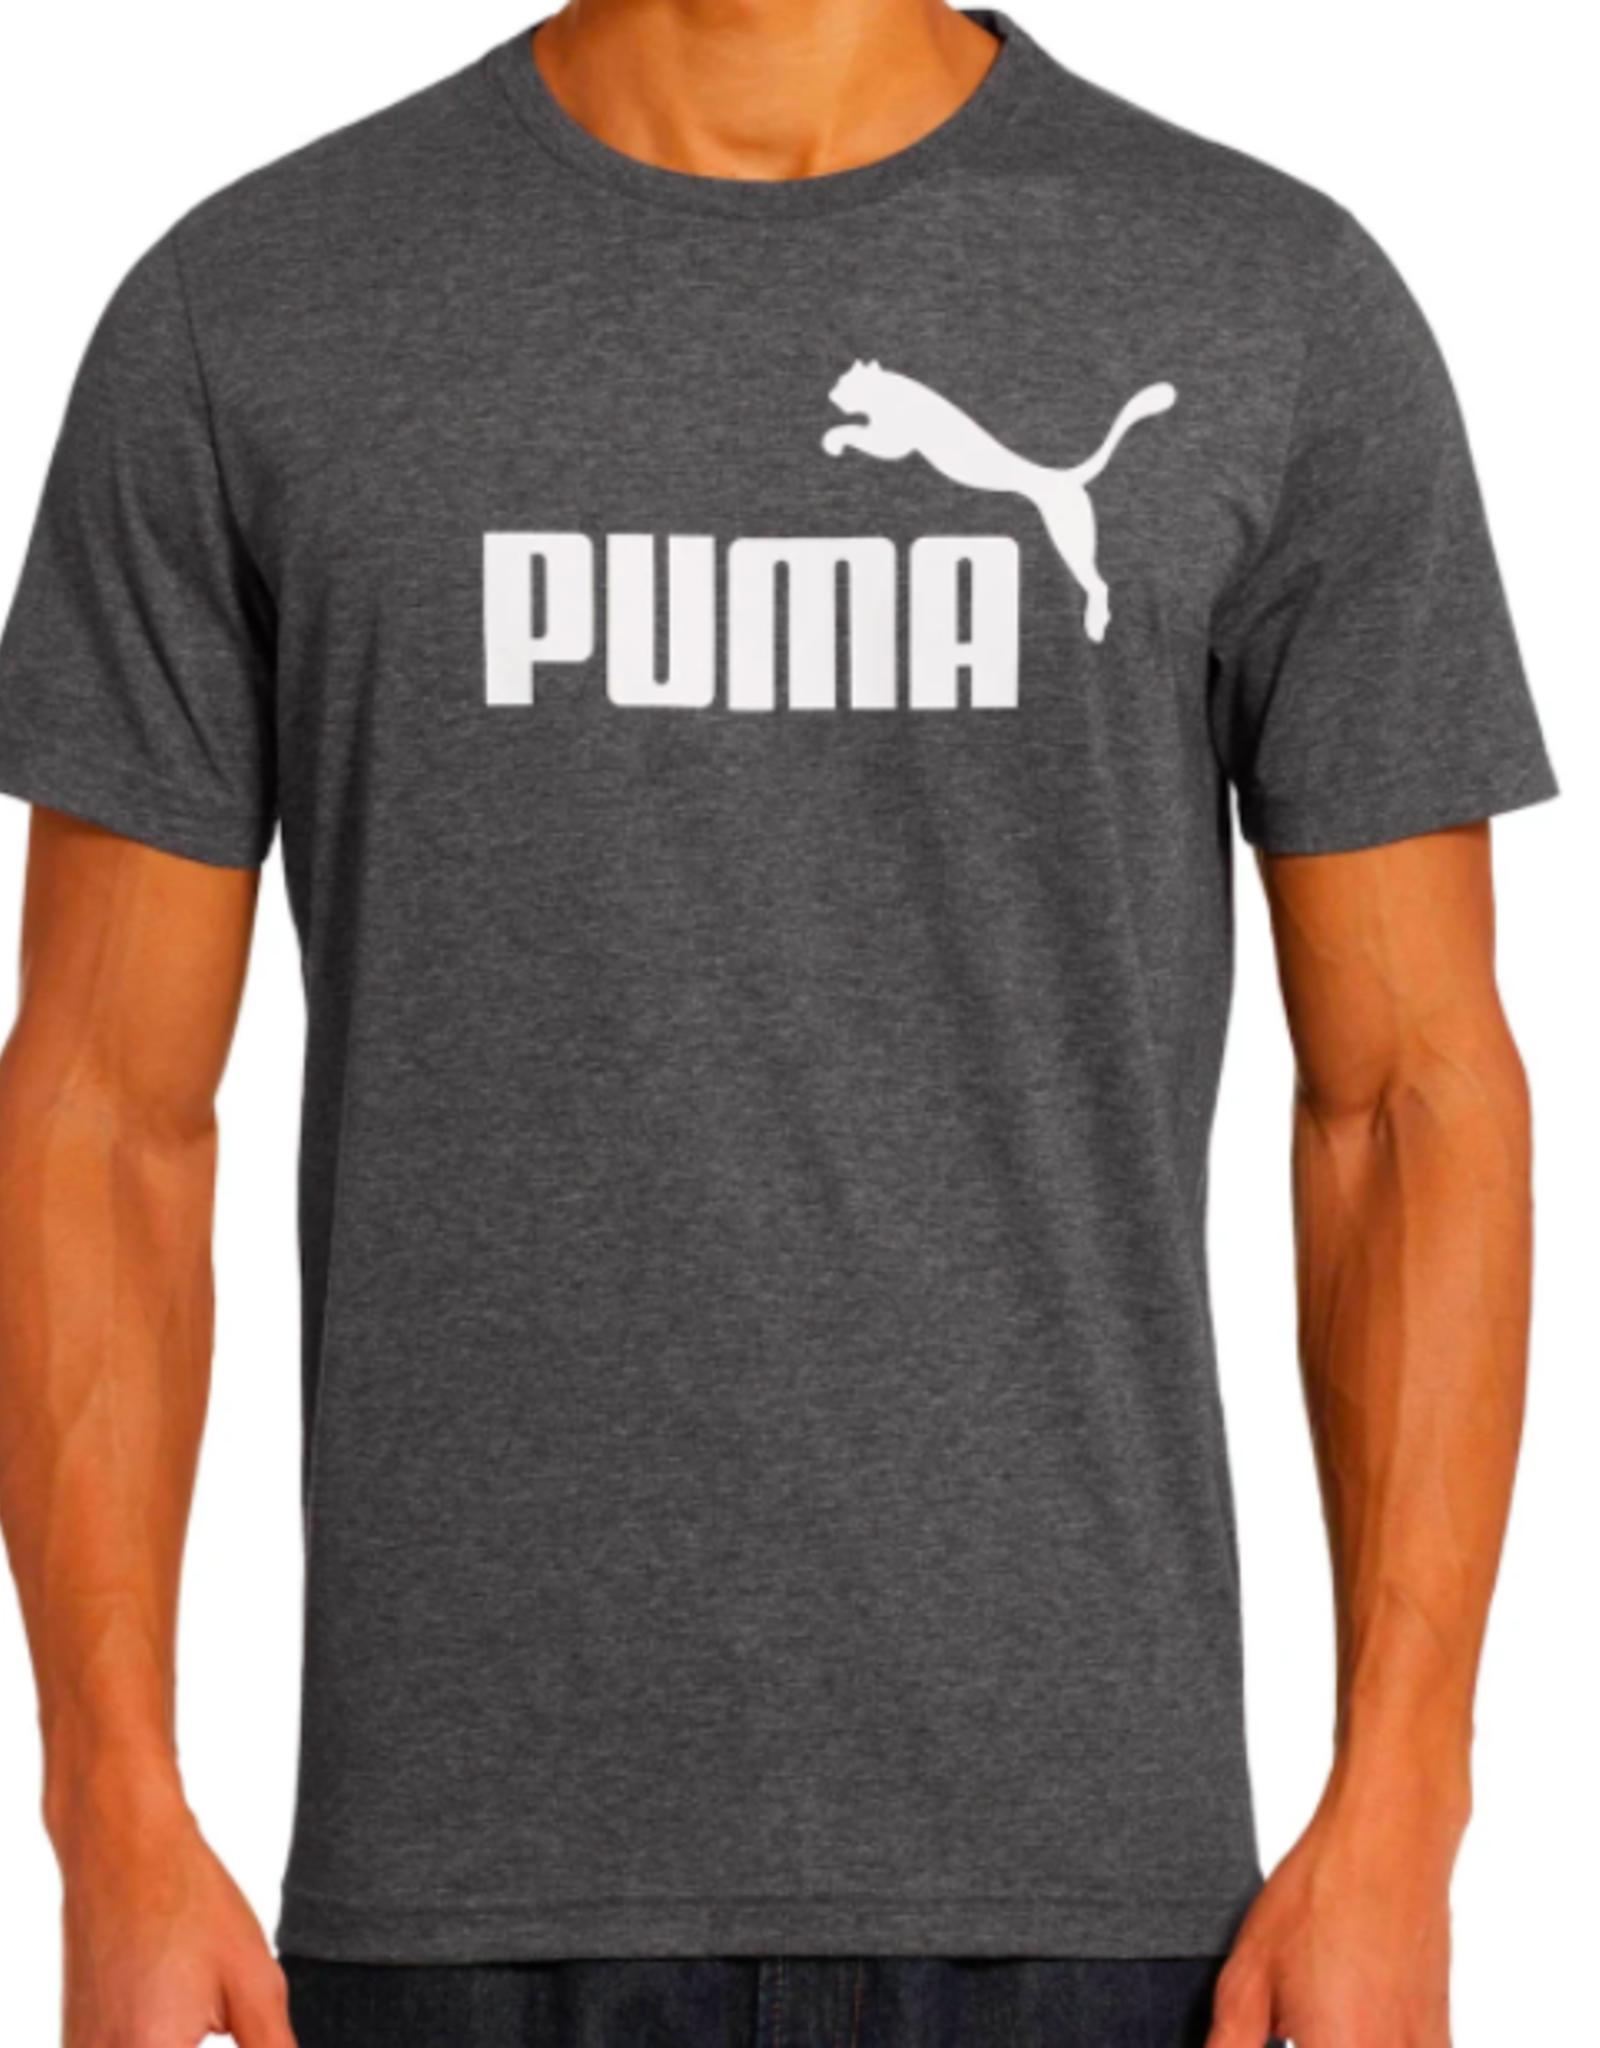 PUMA ESS NO.1 HEATHER TEE/COTTON BLACK-HEATHER